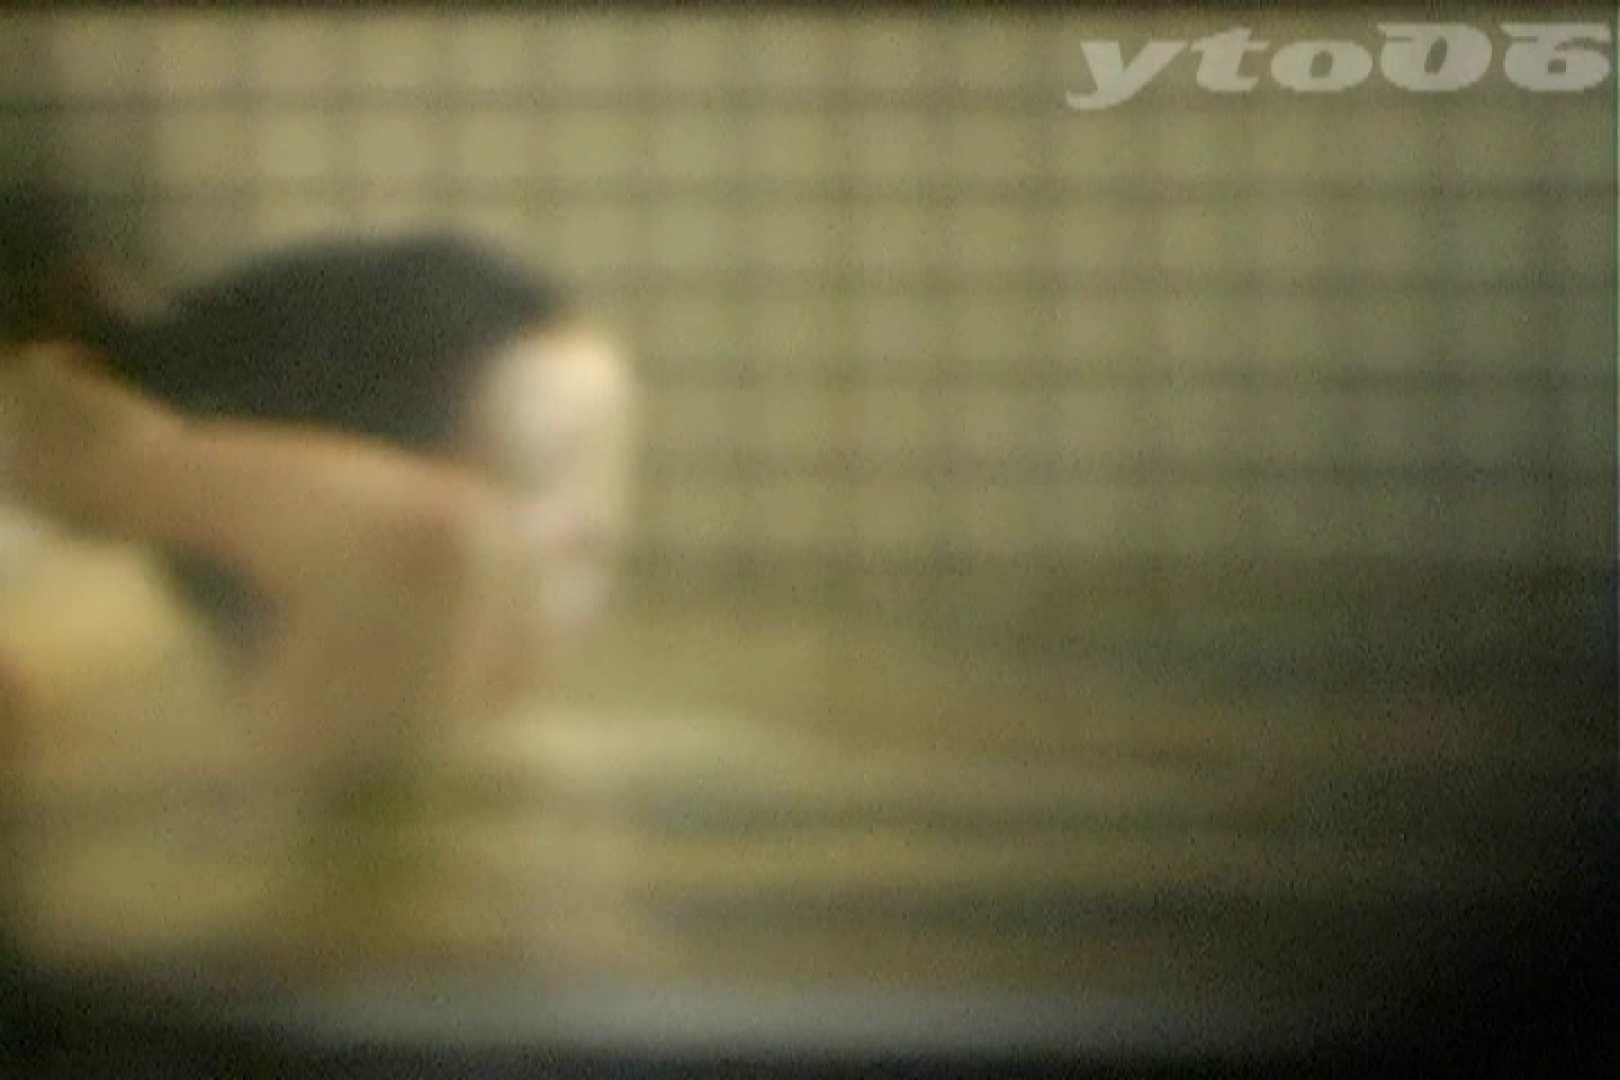 ▲復活限定▲合宿ホテル女風呂盗撮 Vol.34 女風呂   盗撮で悶絶  113画像 17